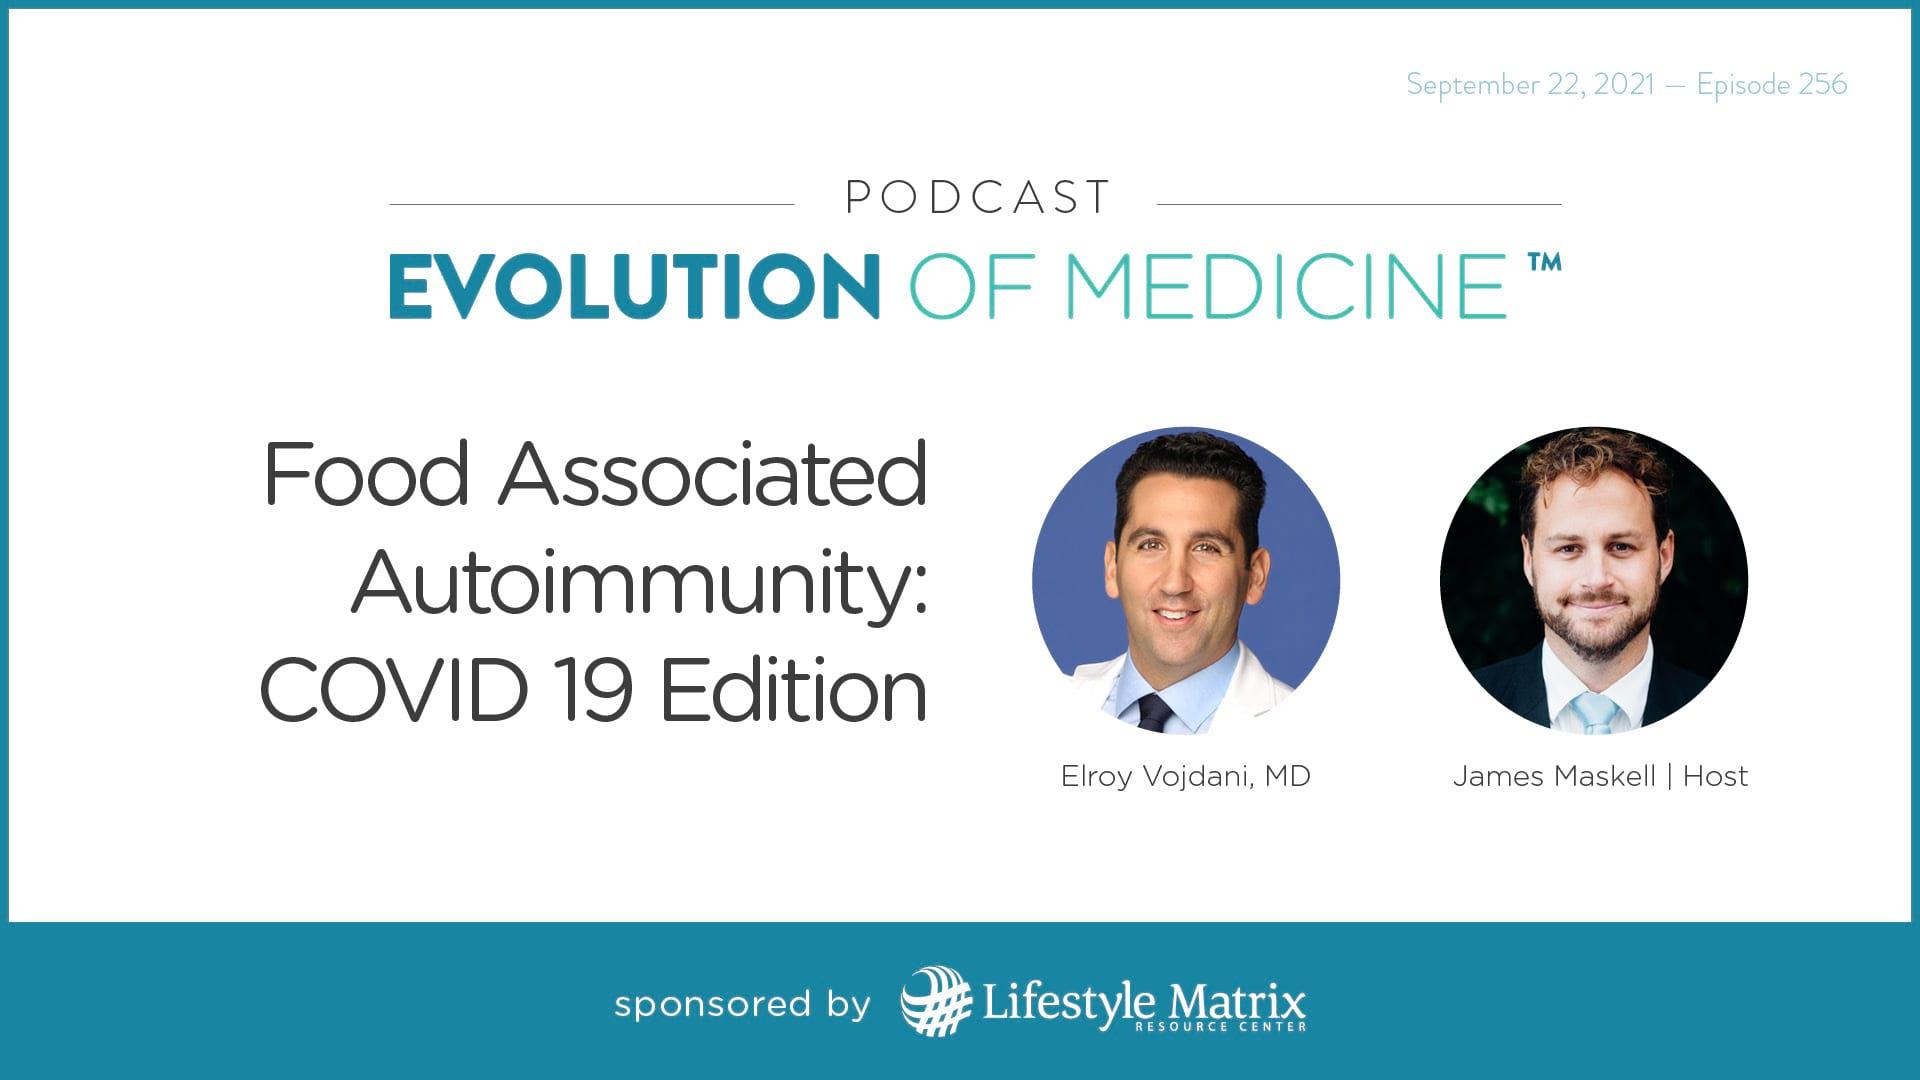 Food Associated AutoImmunity: COVID 19 Edition